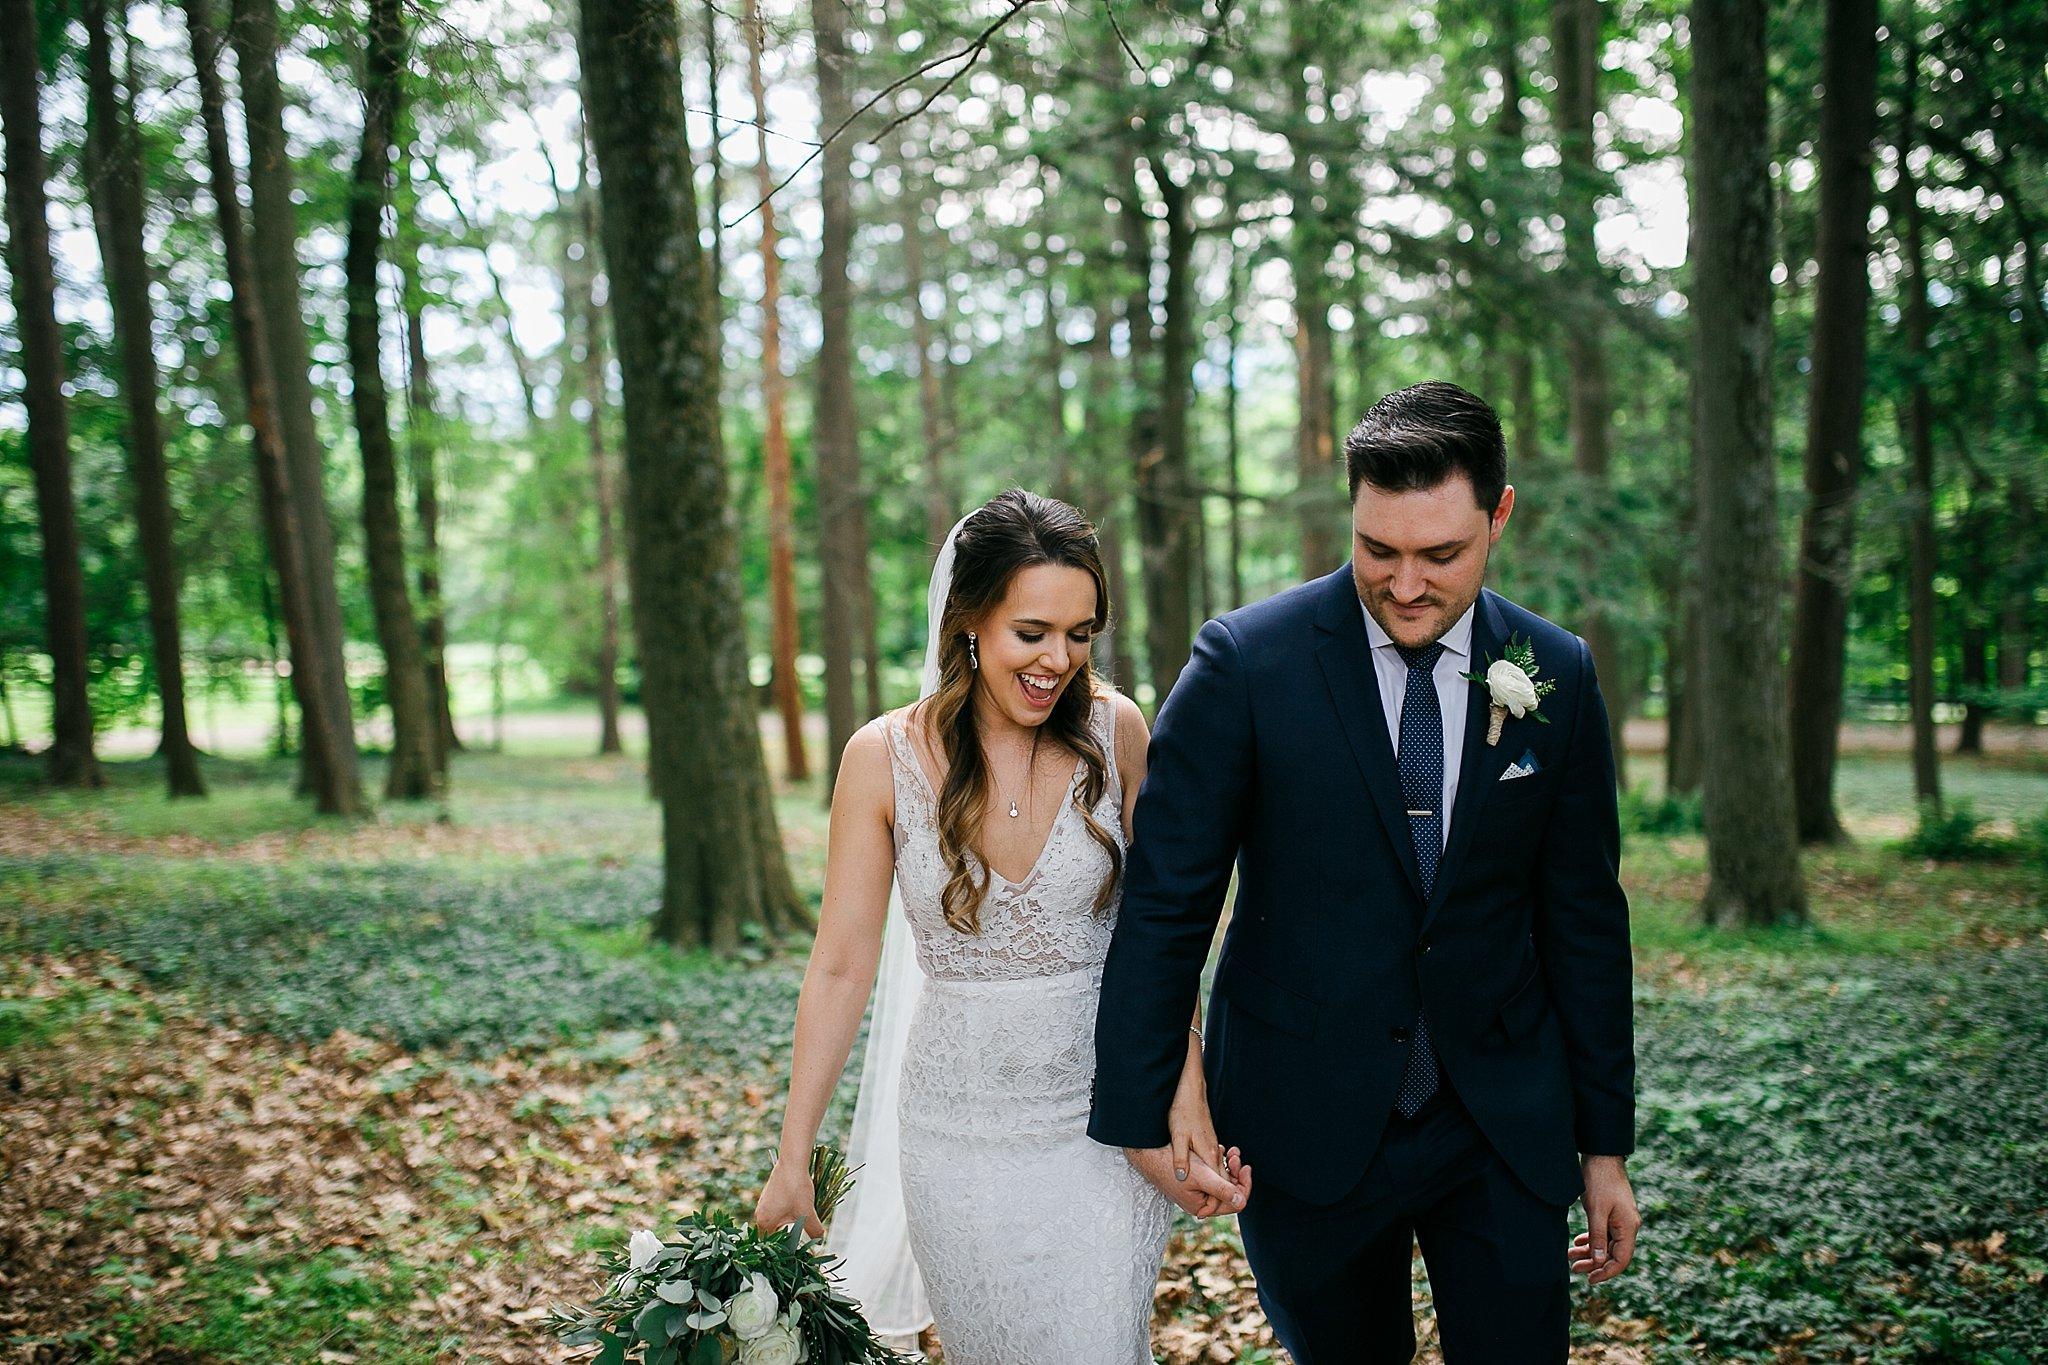 Hudson Valley Weddings at the Hill Hudson New York Wedding Photographer75.jpg